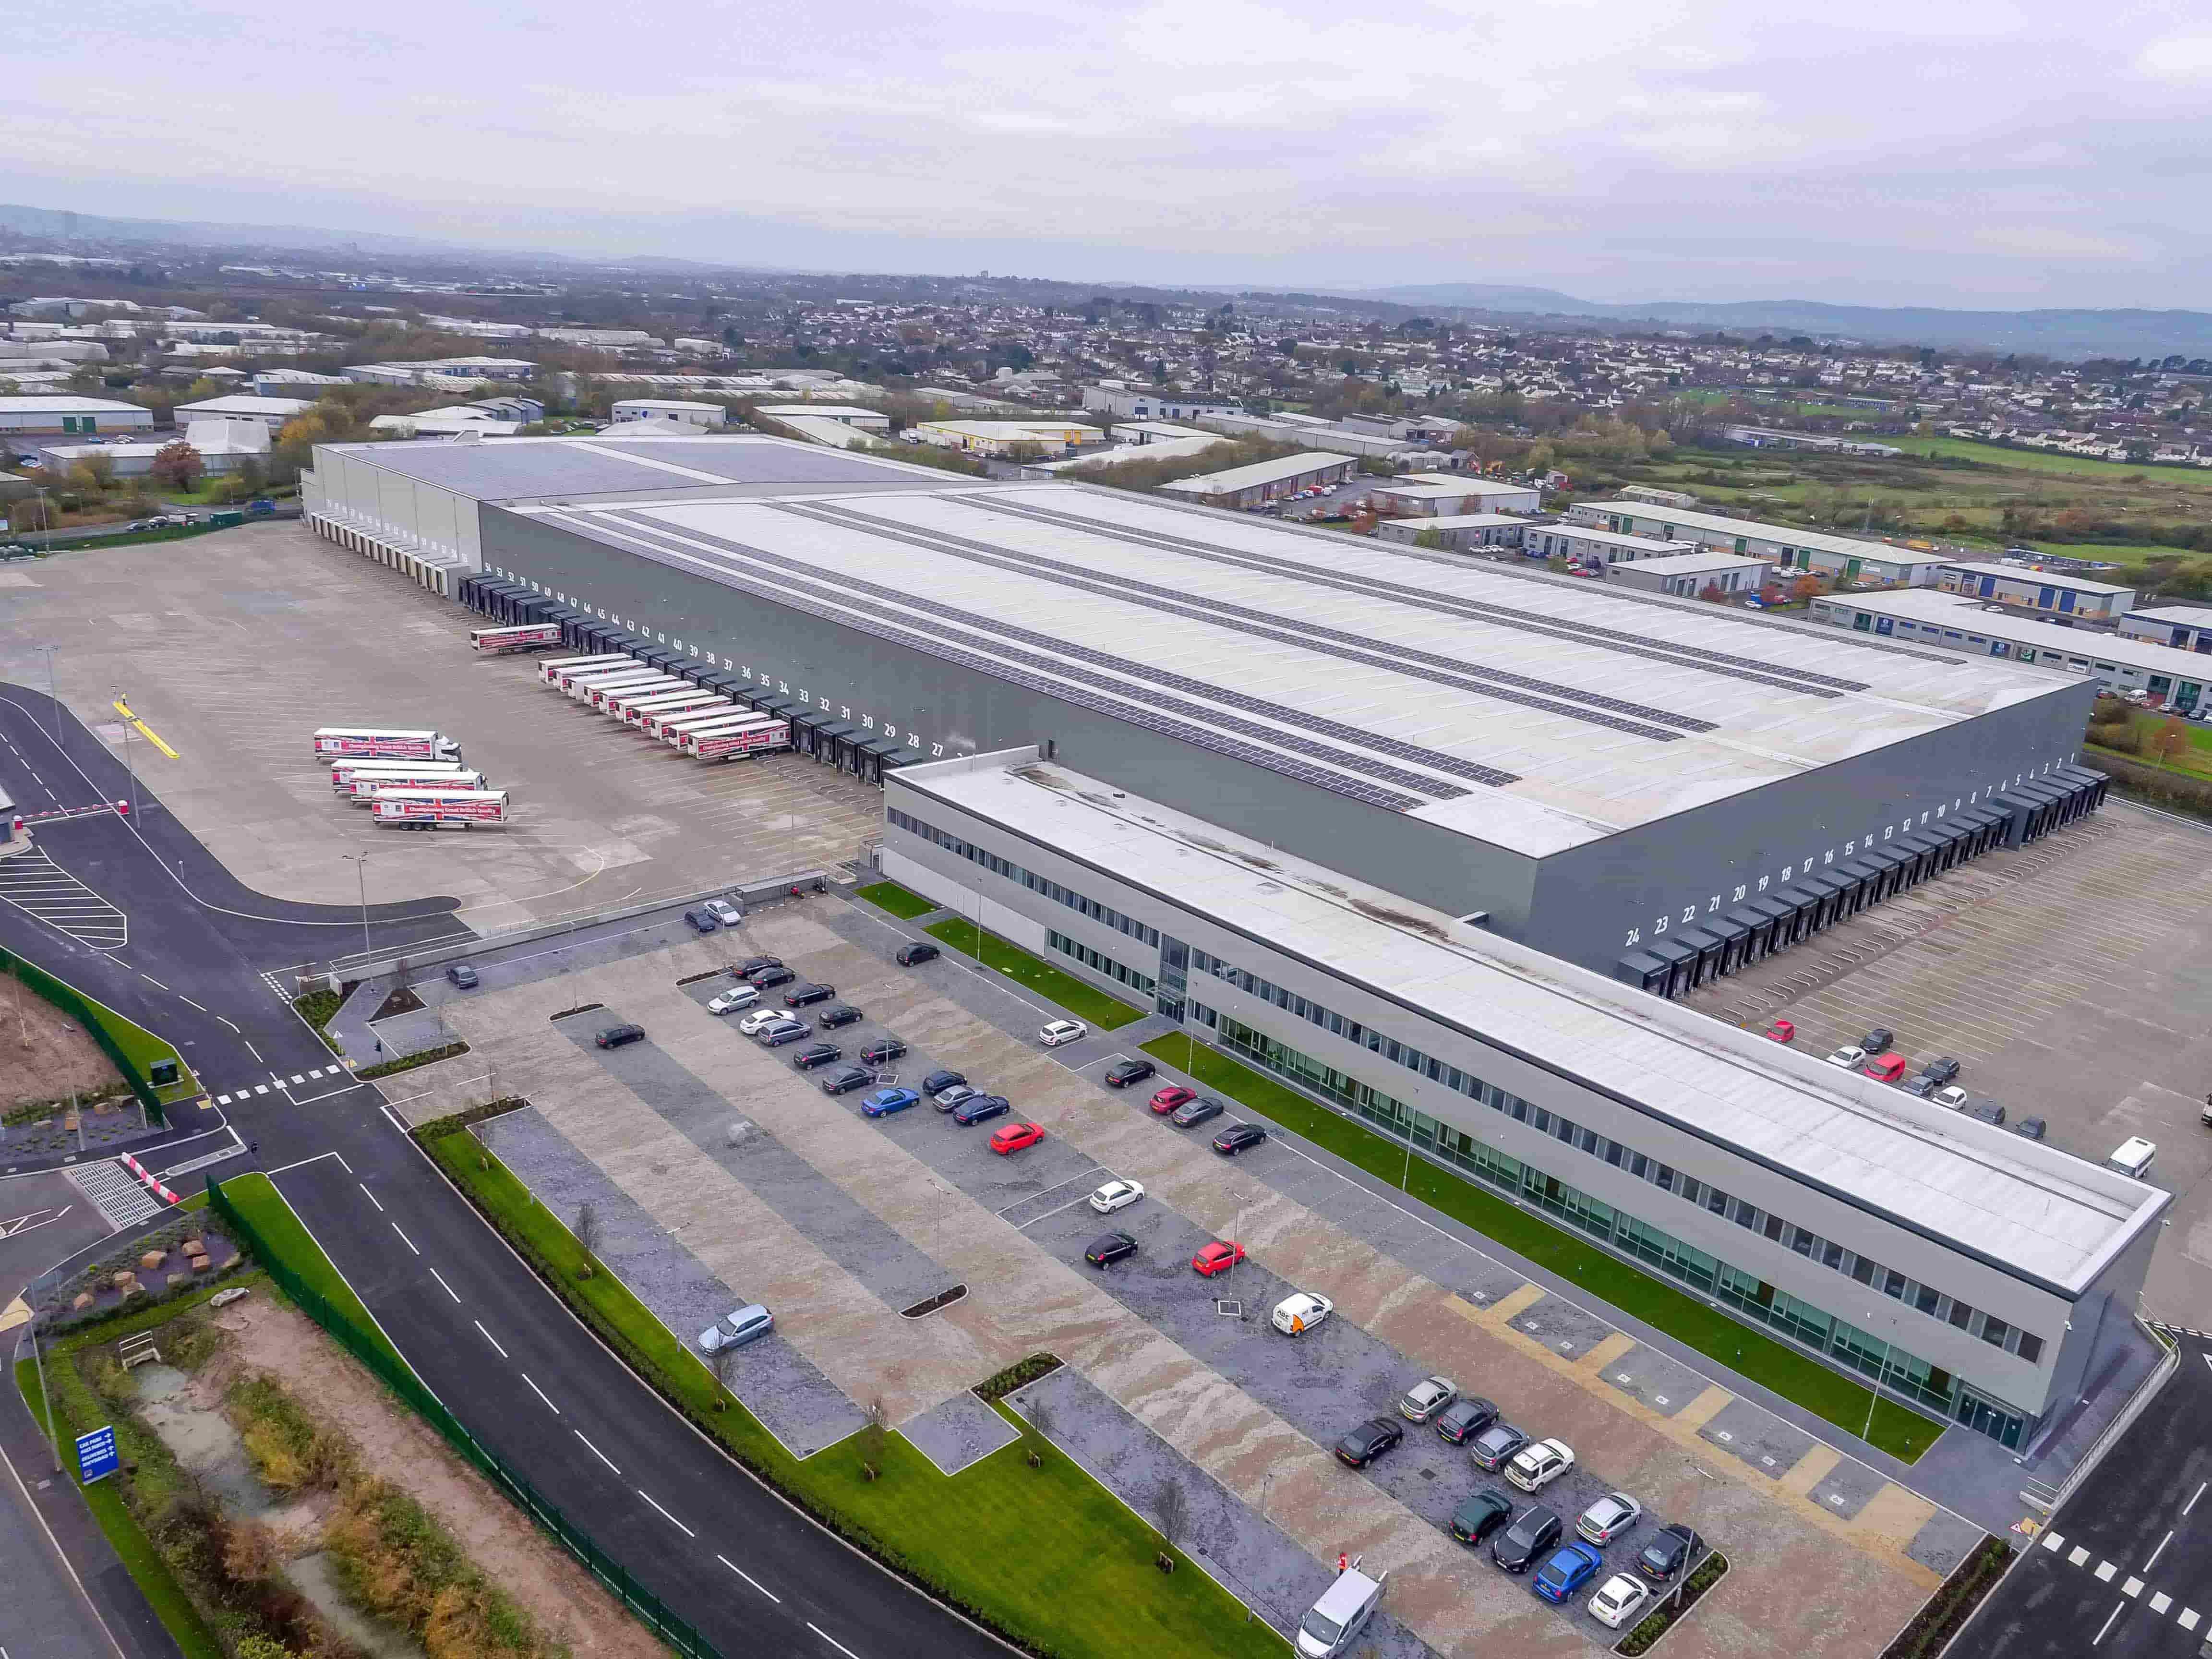 Cardiff Regional Distribution Centre